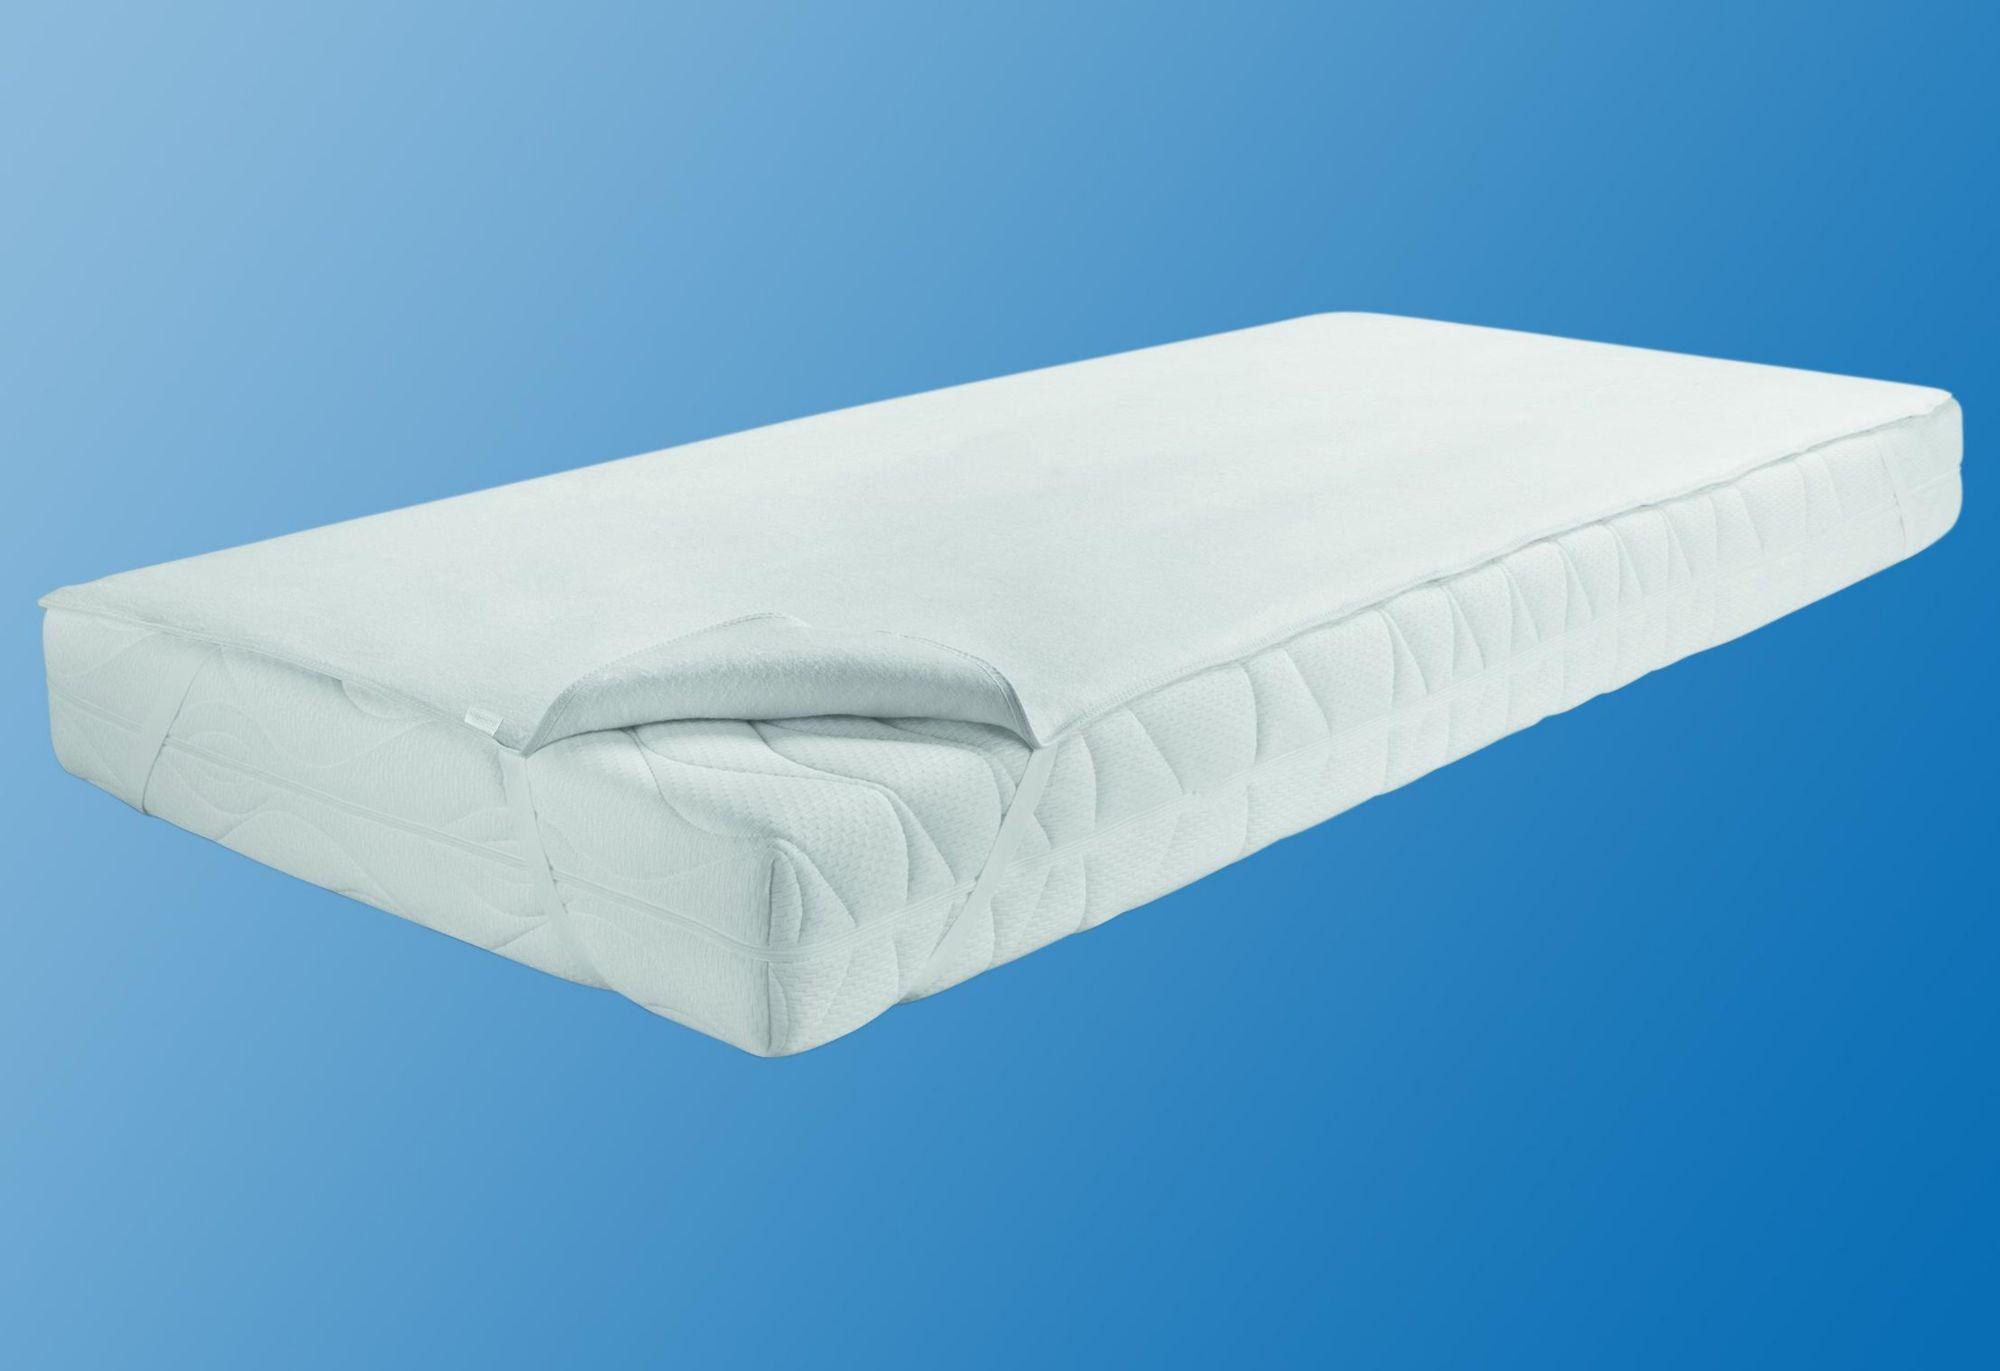 DORMISETTE Matratzenauflagen, »Dormisette Protect & Care Molton-Matratzenauflage«, Dormisette